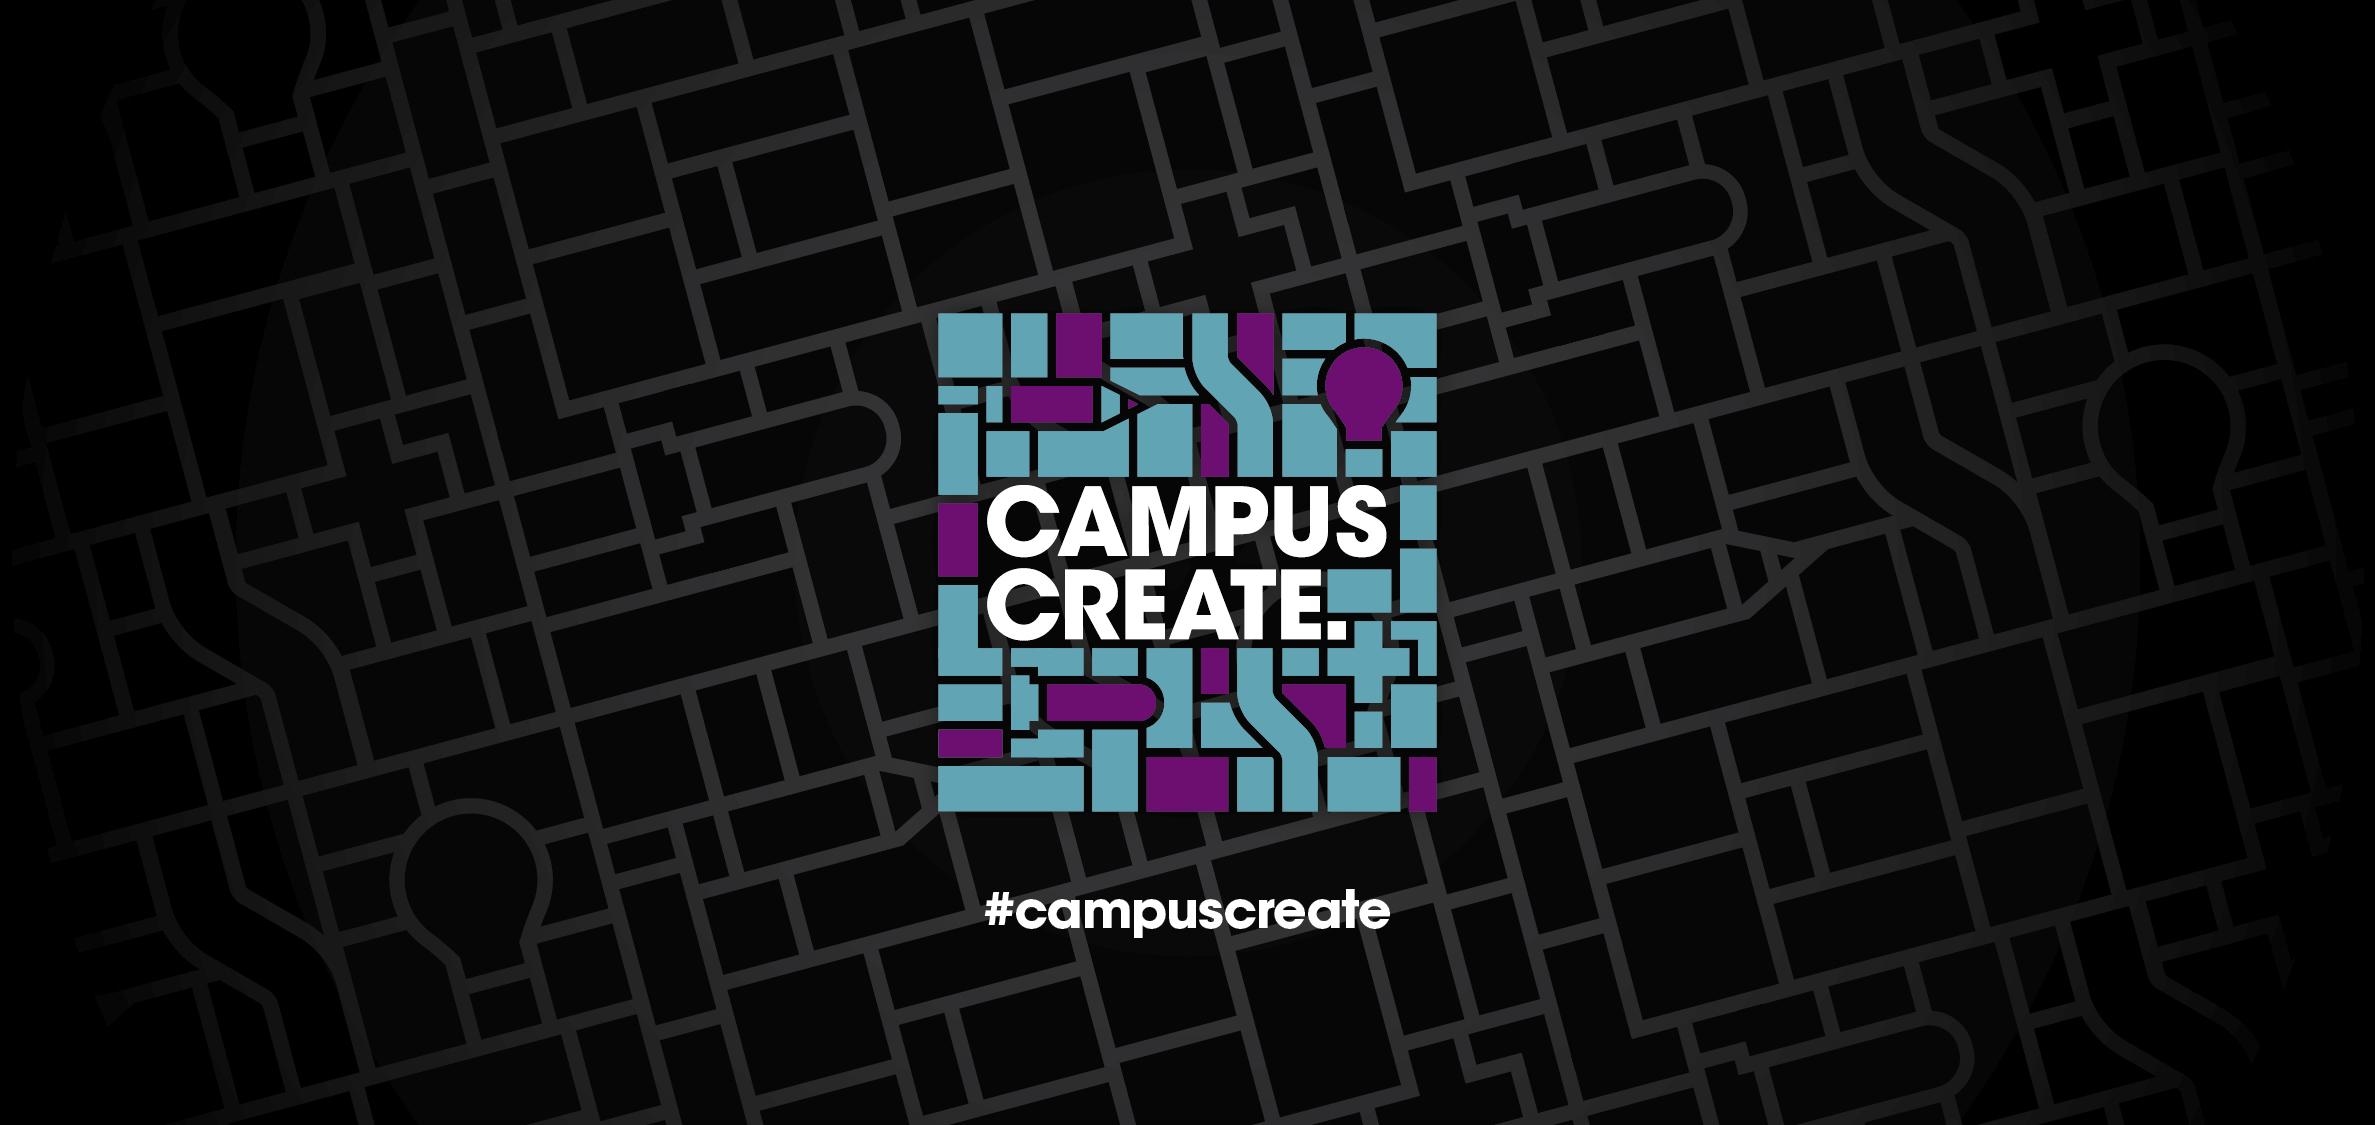 campuscreate banner